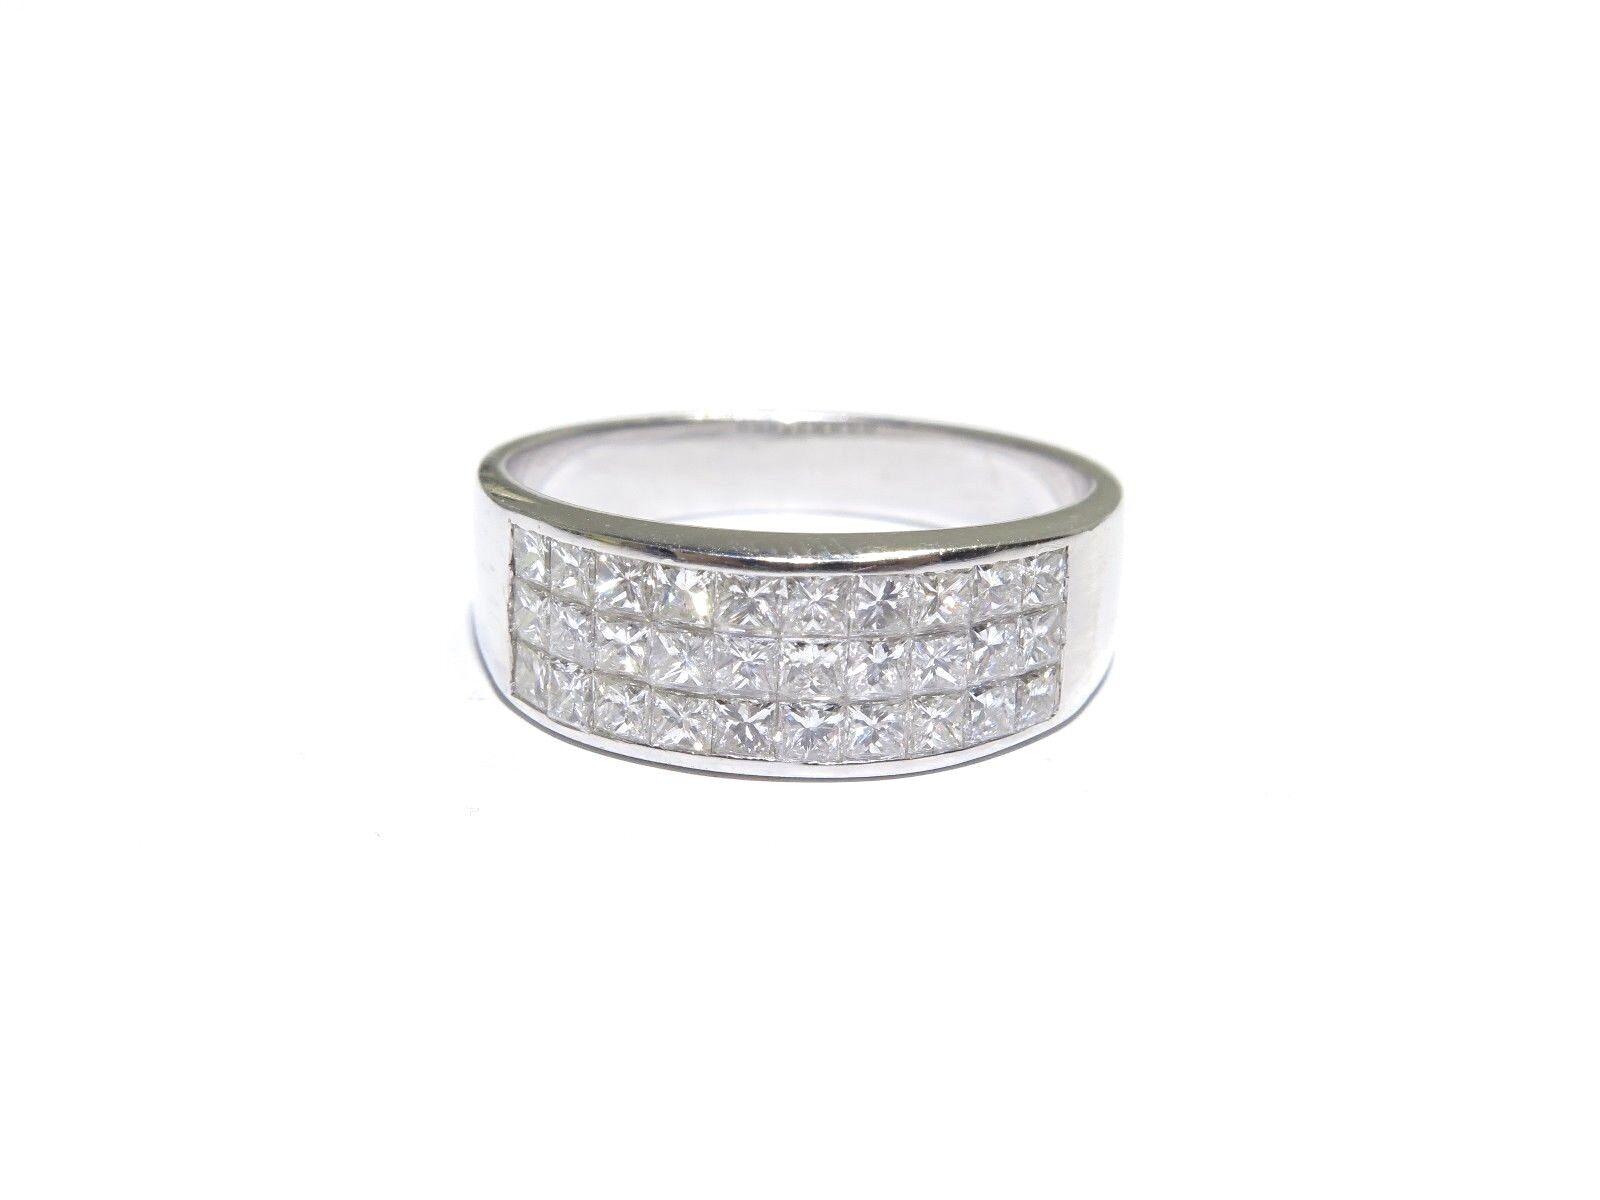 ac441800ec22a White 18k gold Setting Ring Diamond White 1.08ct Invisible Cut ...